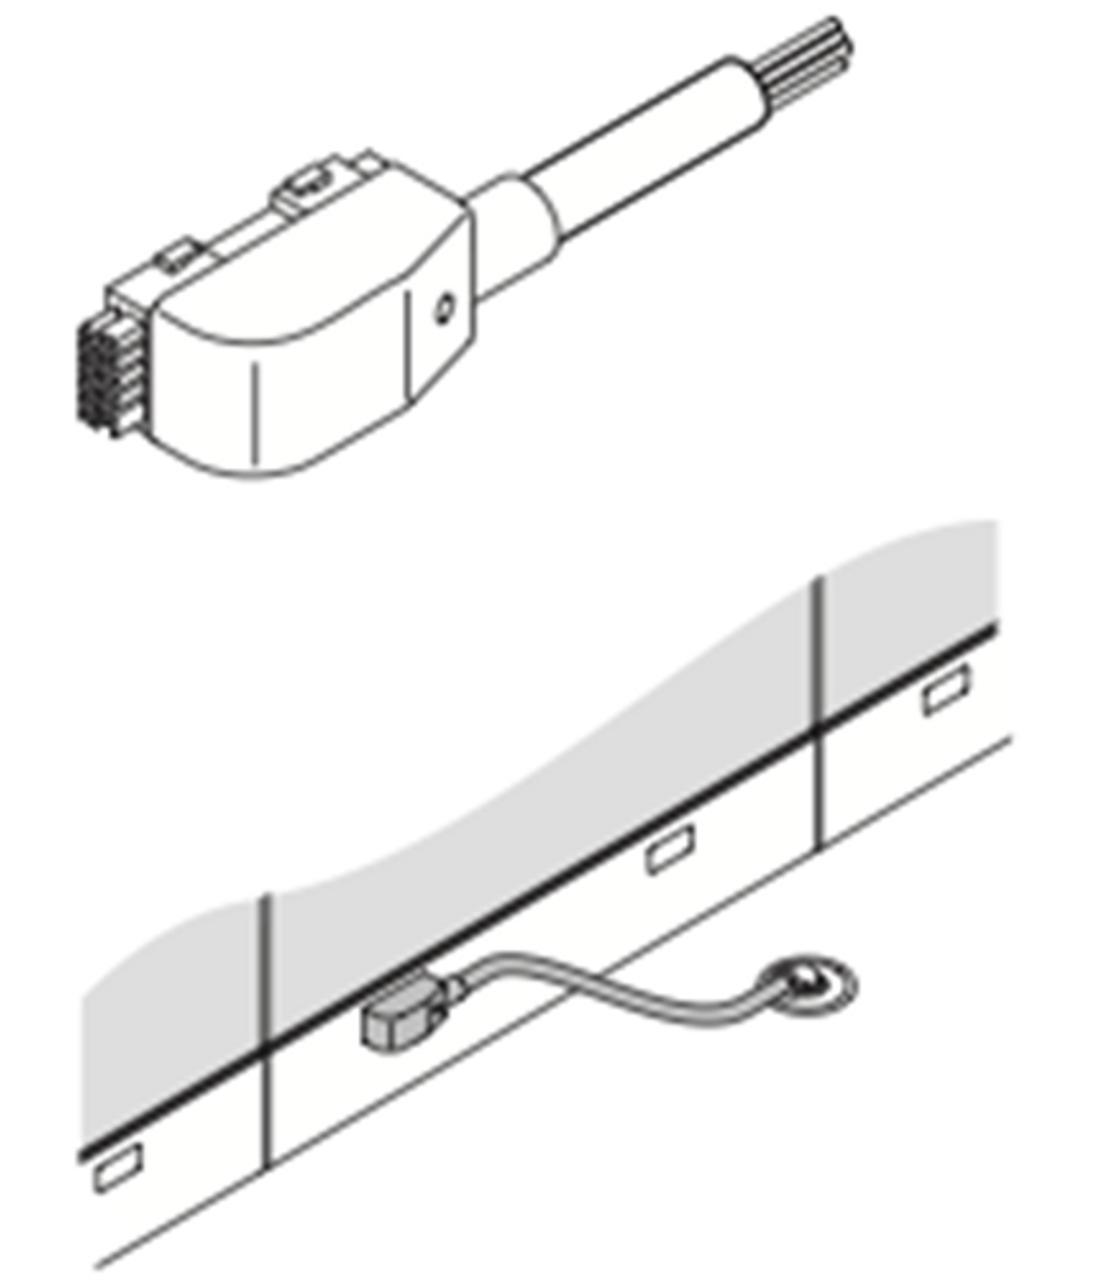 Haworth Premise NEBF-1 Base Feed Module Hardwire Connection on